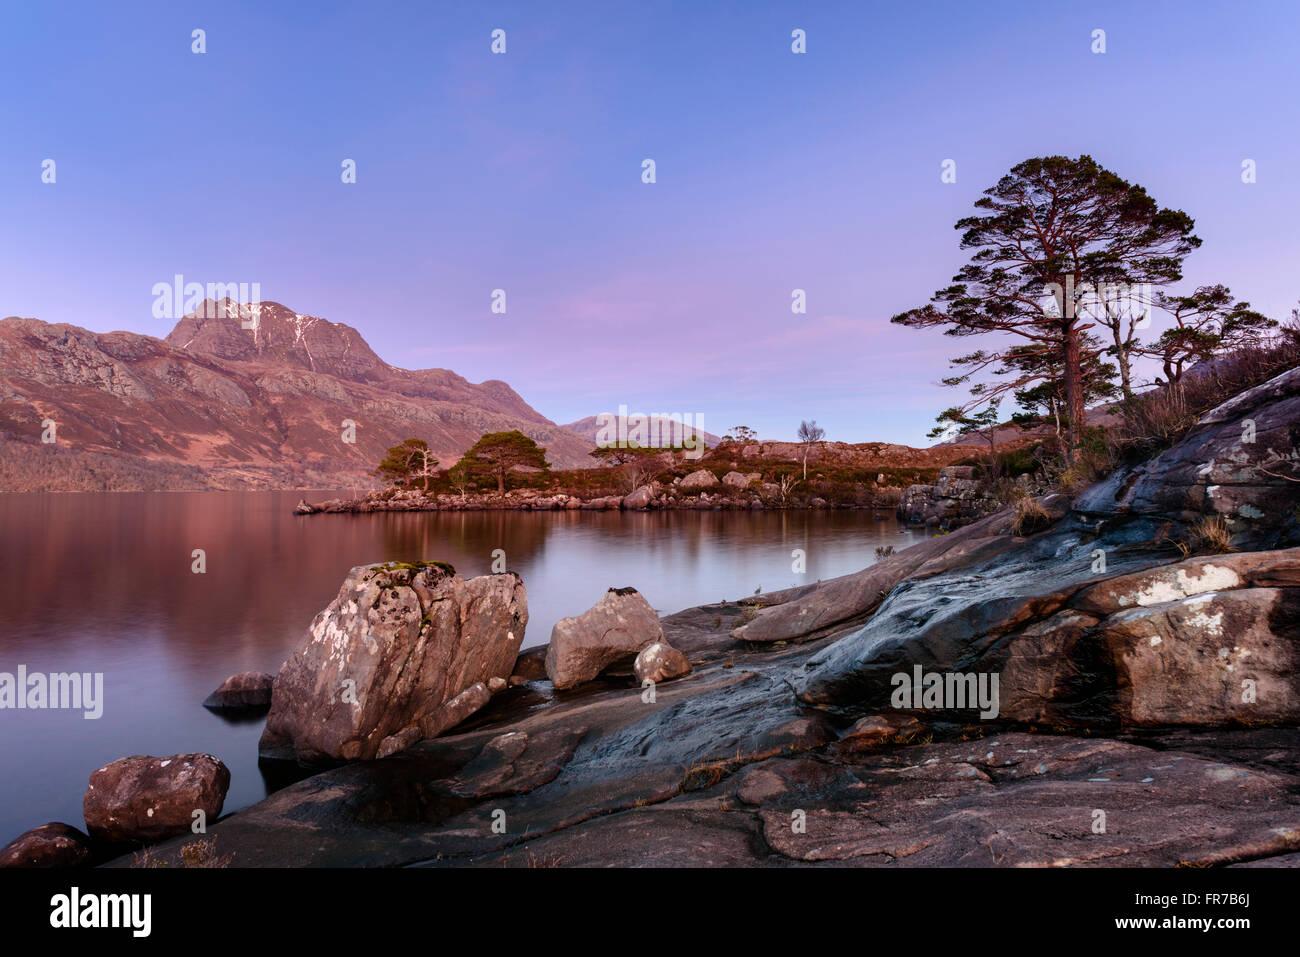 Loch Maree - Stock Image